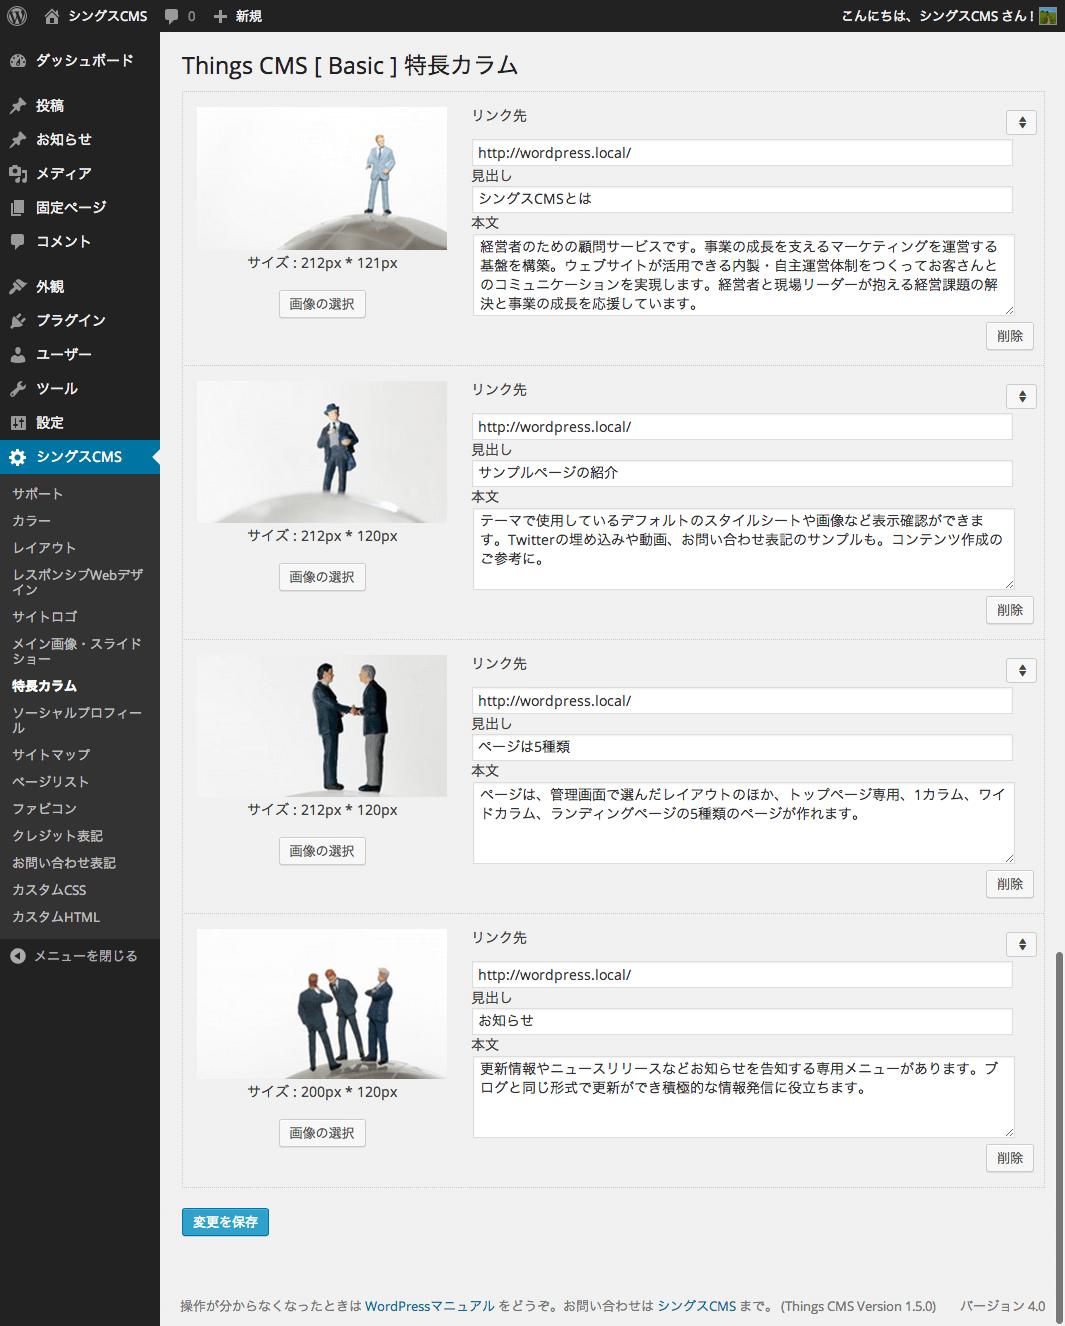 screenshot-thingscms-top-featured-fulfill-fs8